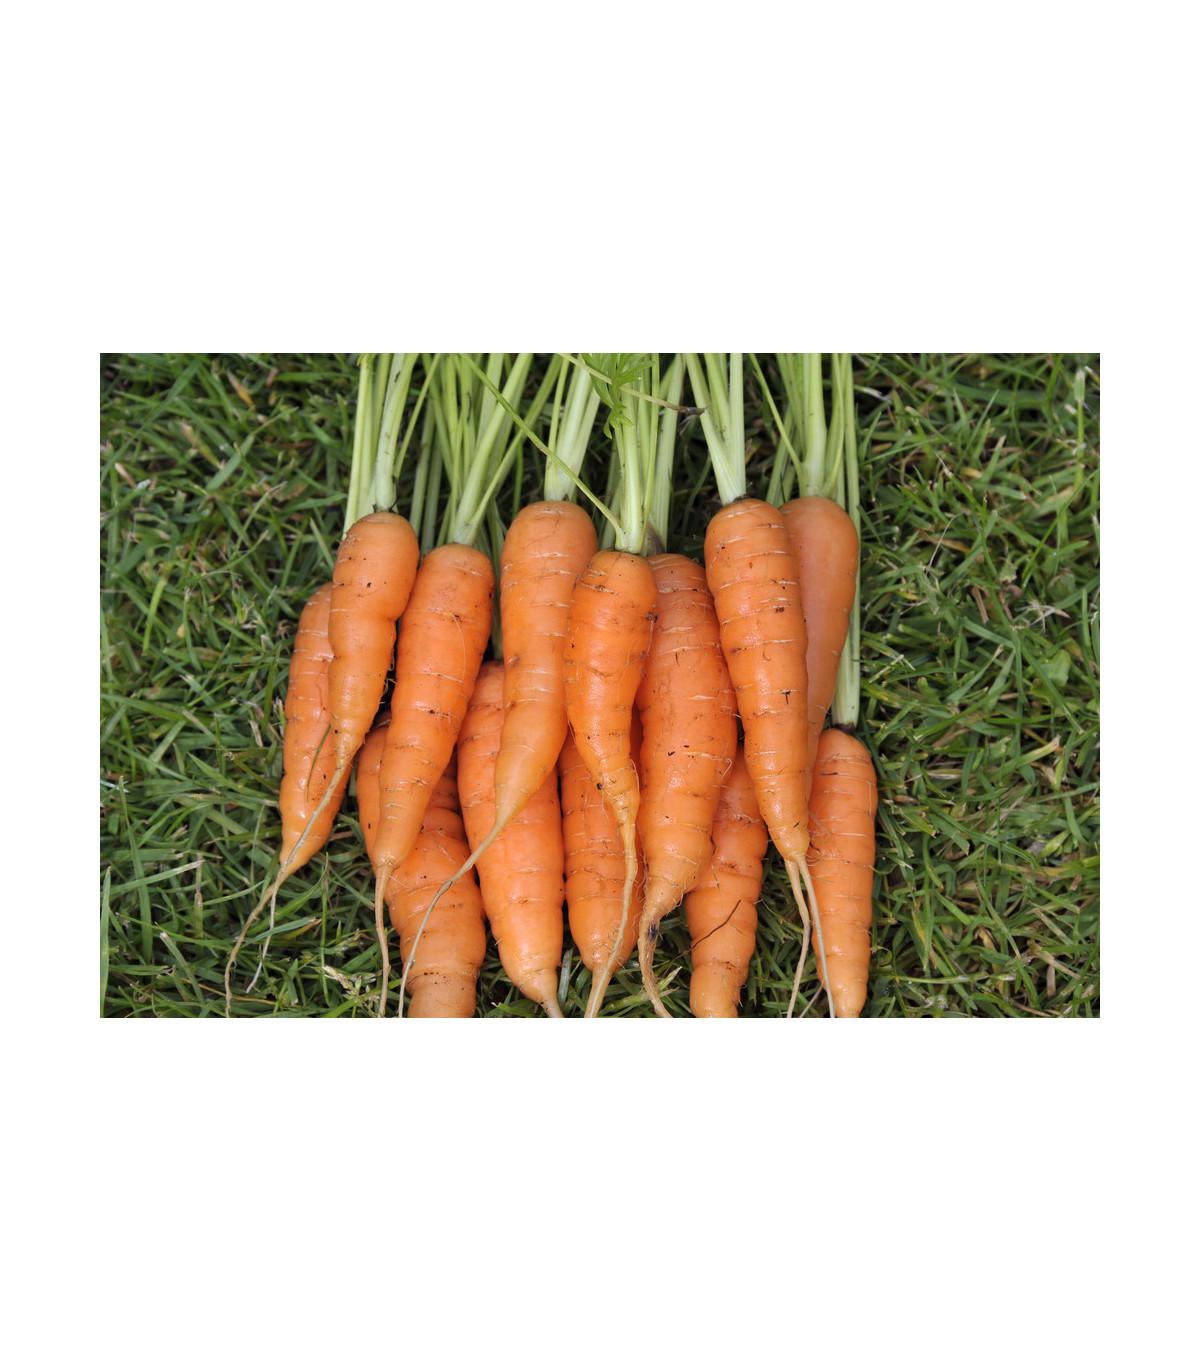 Mrkev karotka Amsterdam raná - Daucus carota - osivo mrkve - 1 gr